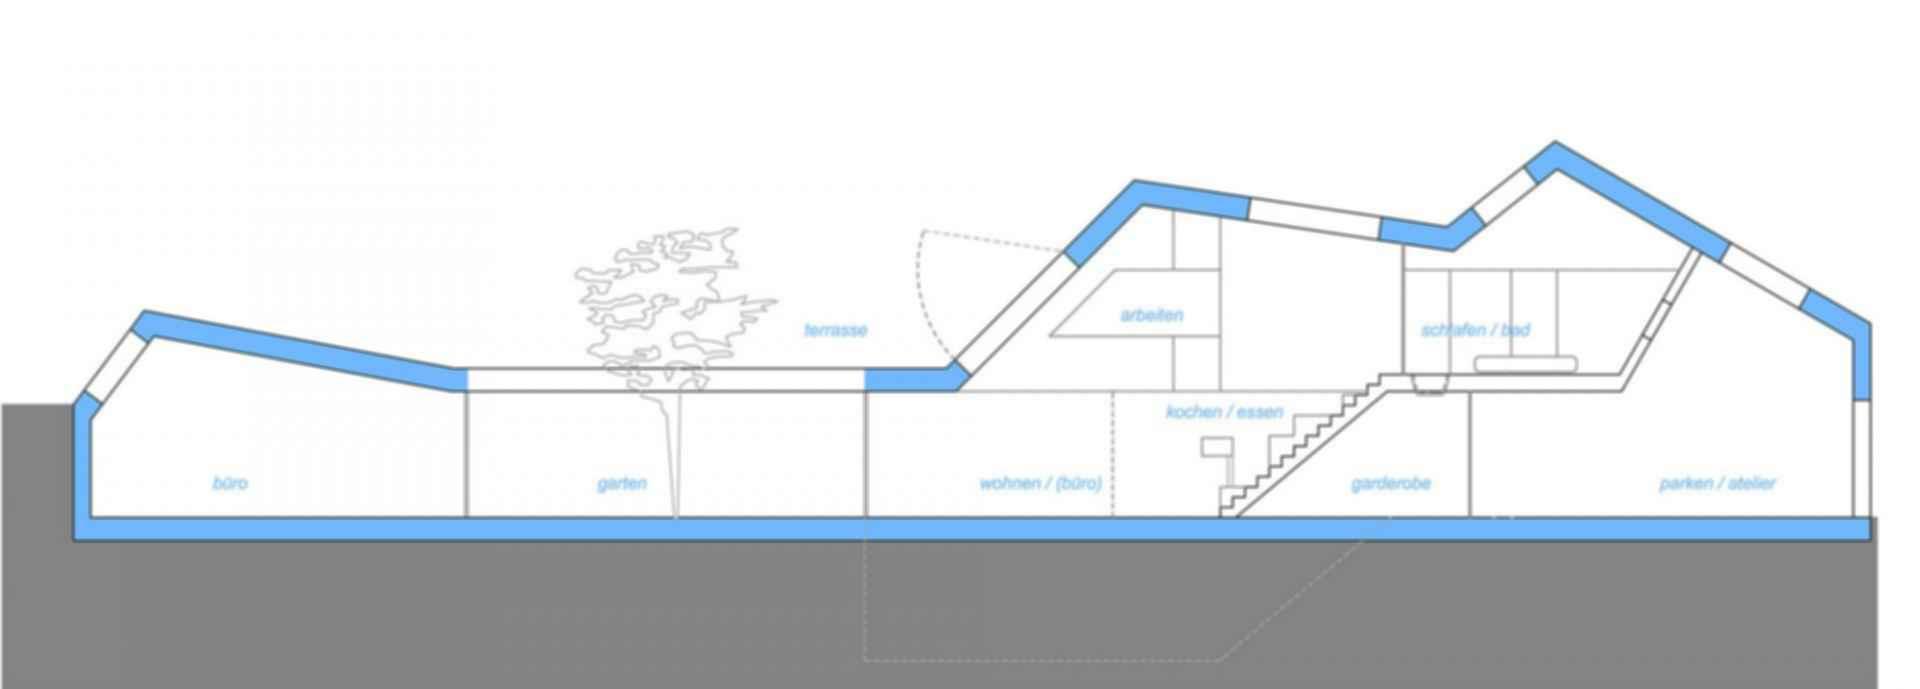 CJ5 House - Concept Design